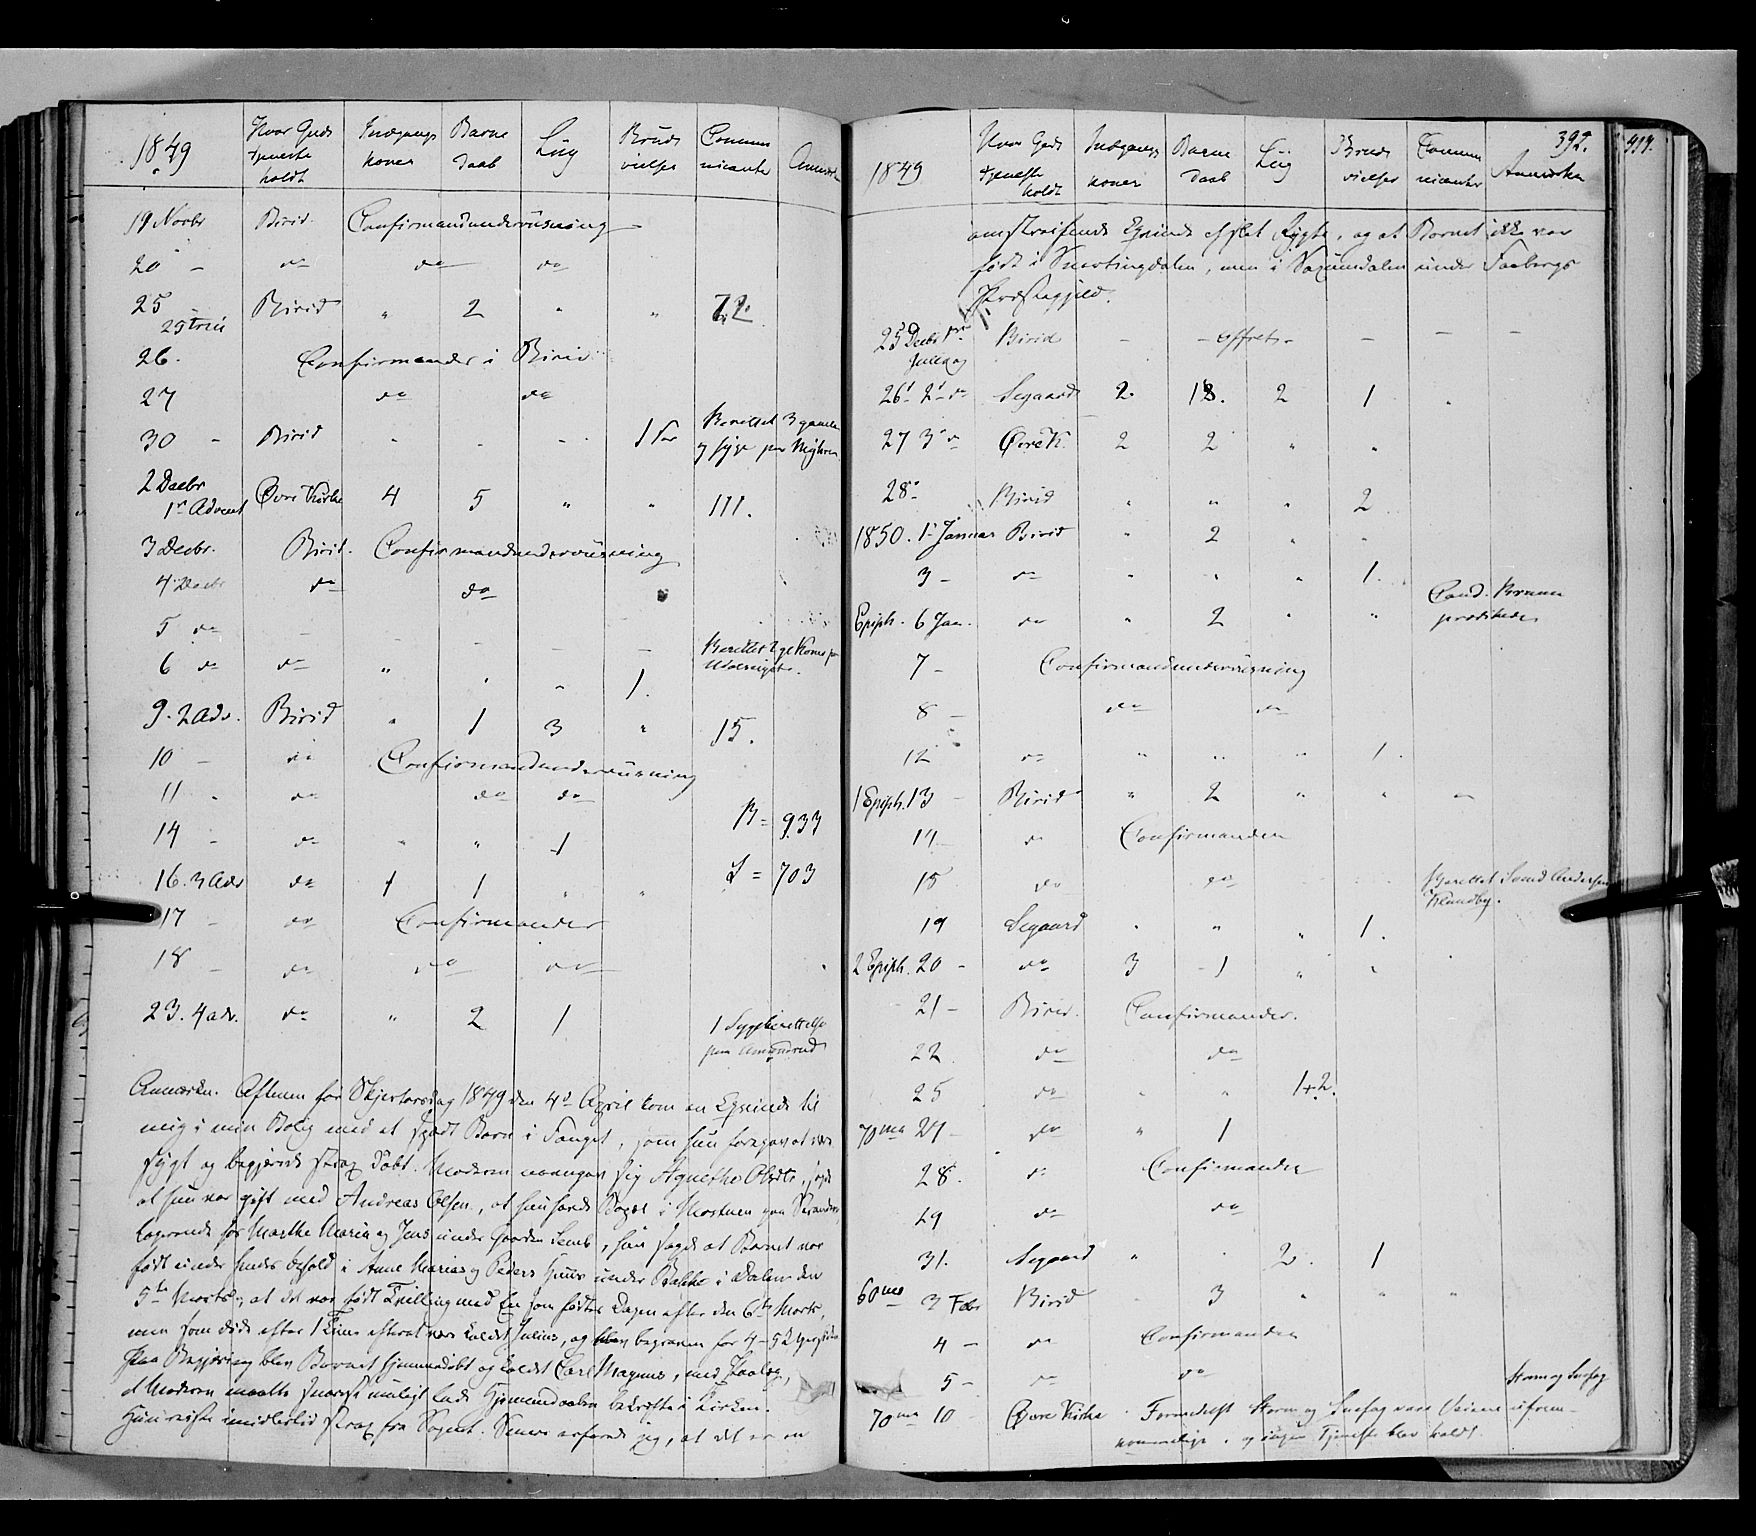 SAH, Biri prestekontor, Ministerialbok nr. 5, 1843-1854, s. 392